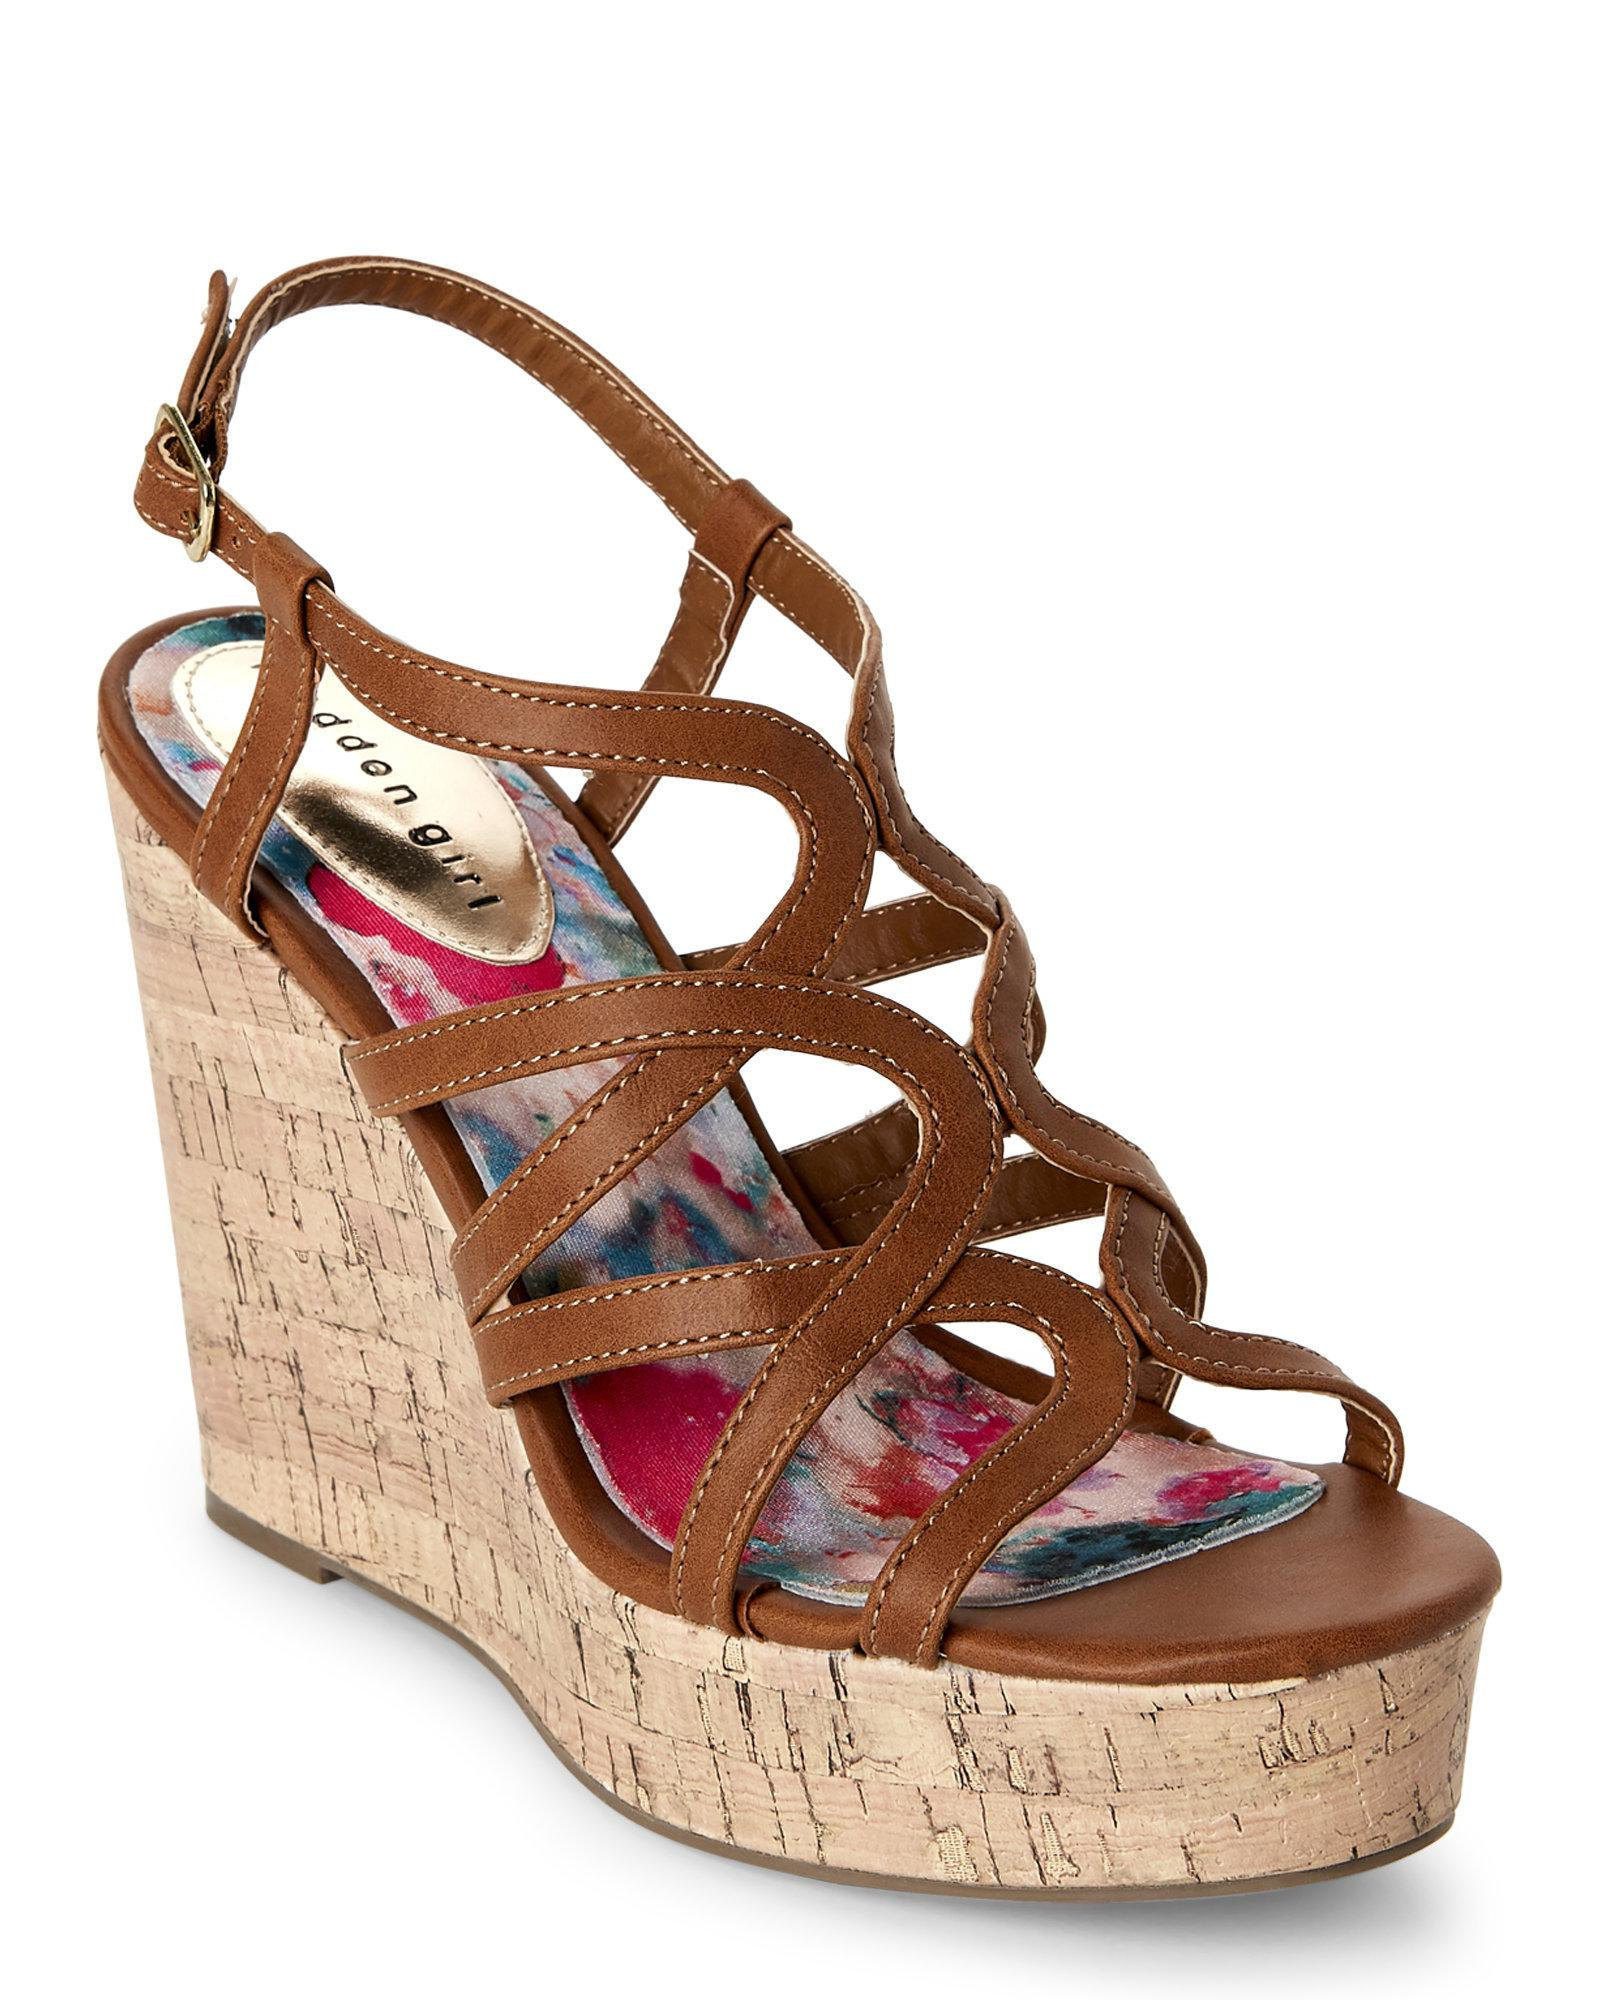 Madden Girl. Women's Brown Cognac Paris Elmaa Cork Platform Wedge Sandals